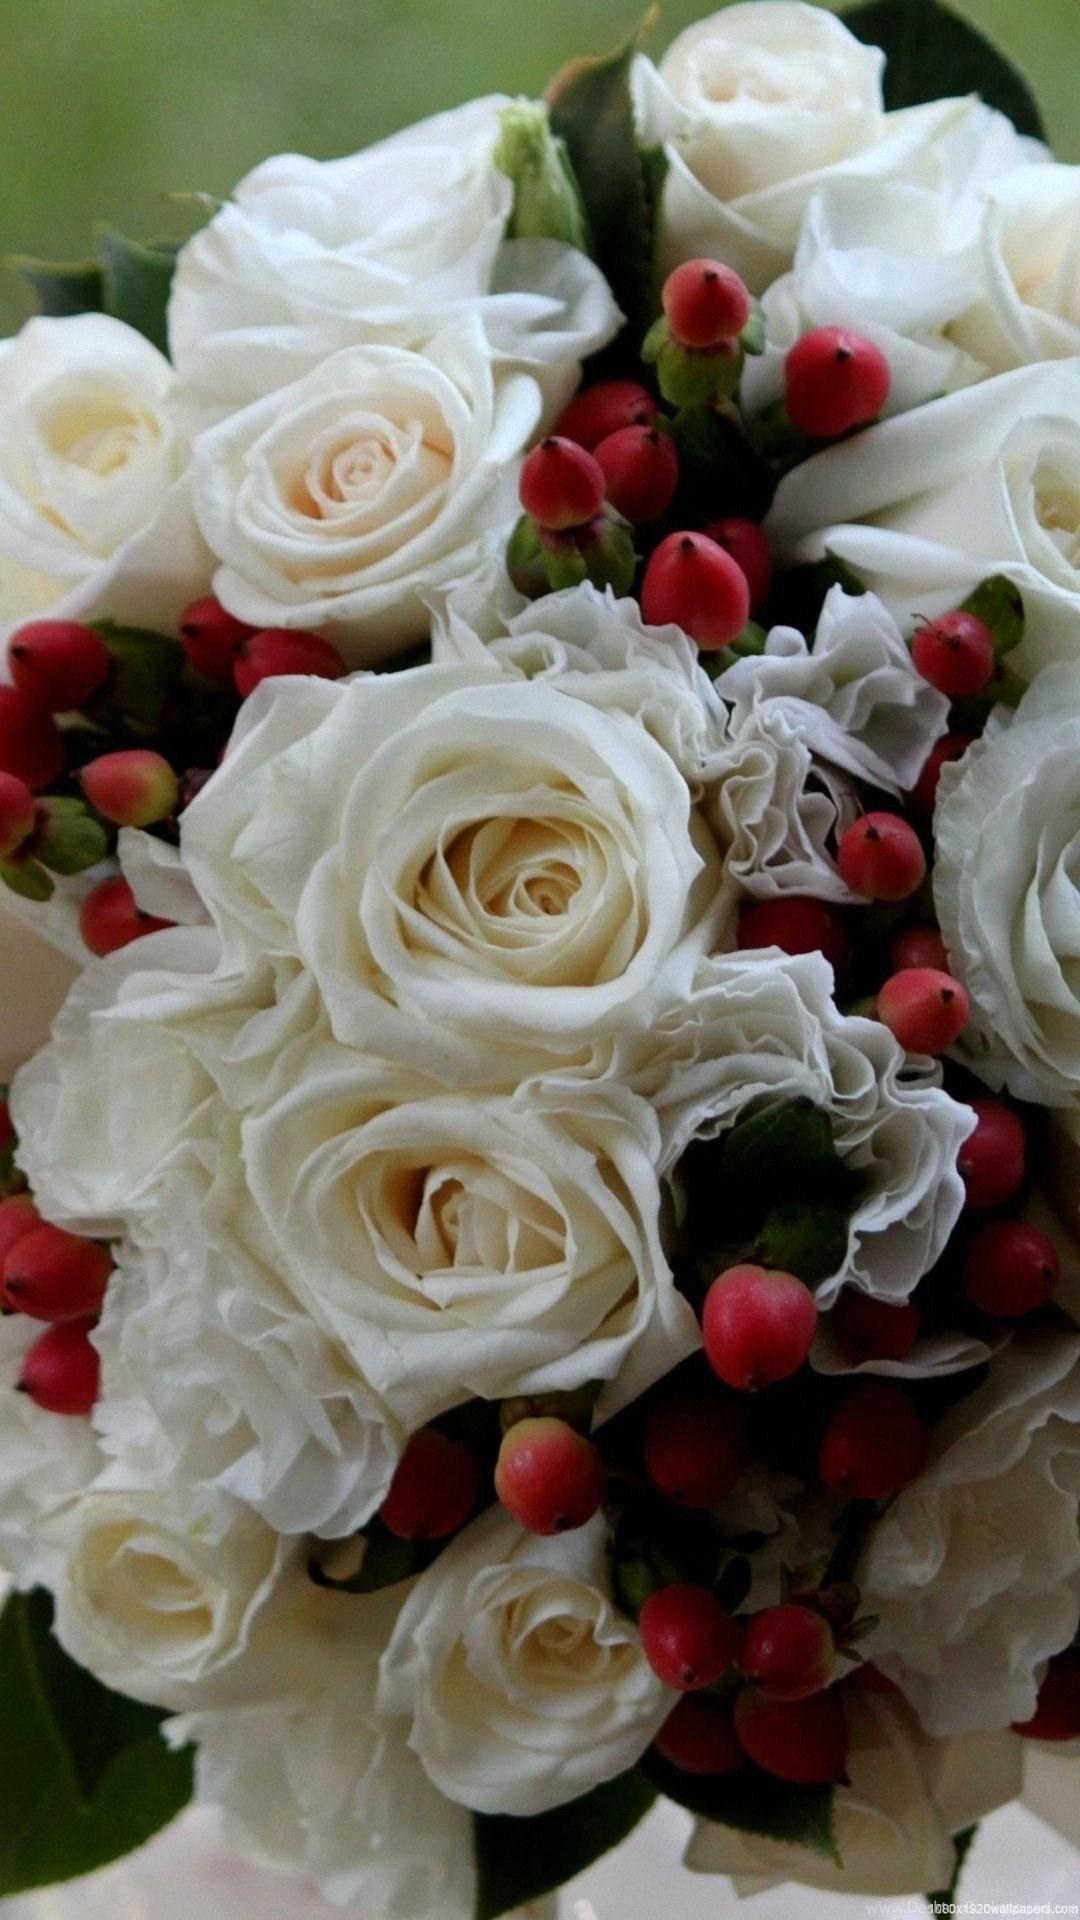 1080x1920 Design Beautiful Rose Flowers Wallpapers Hd Desktop Background